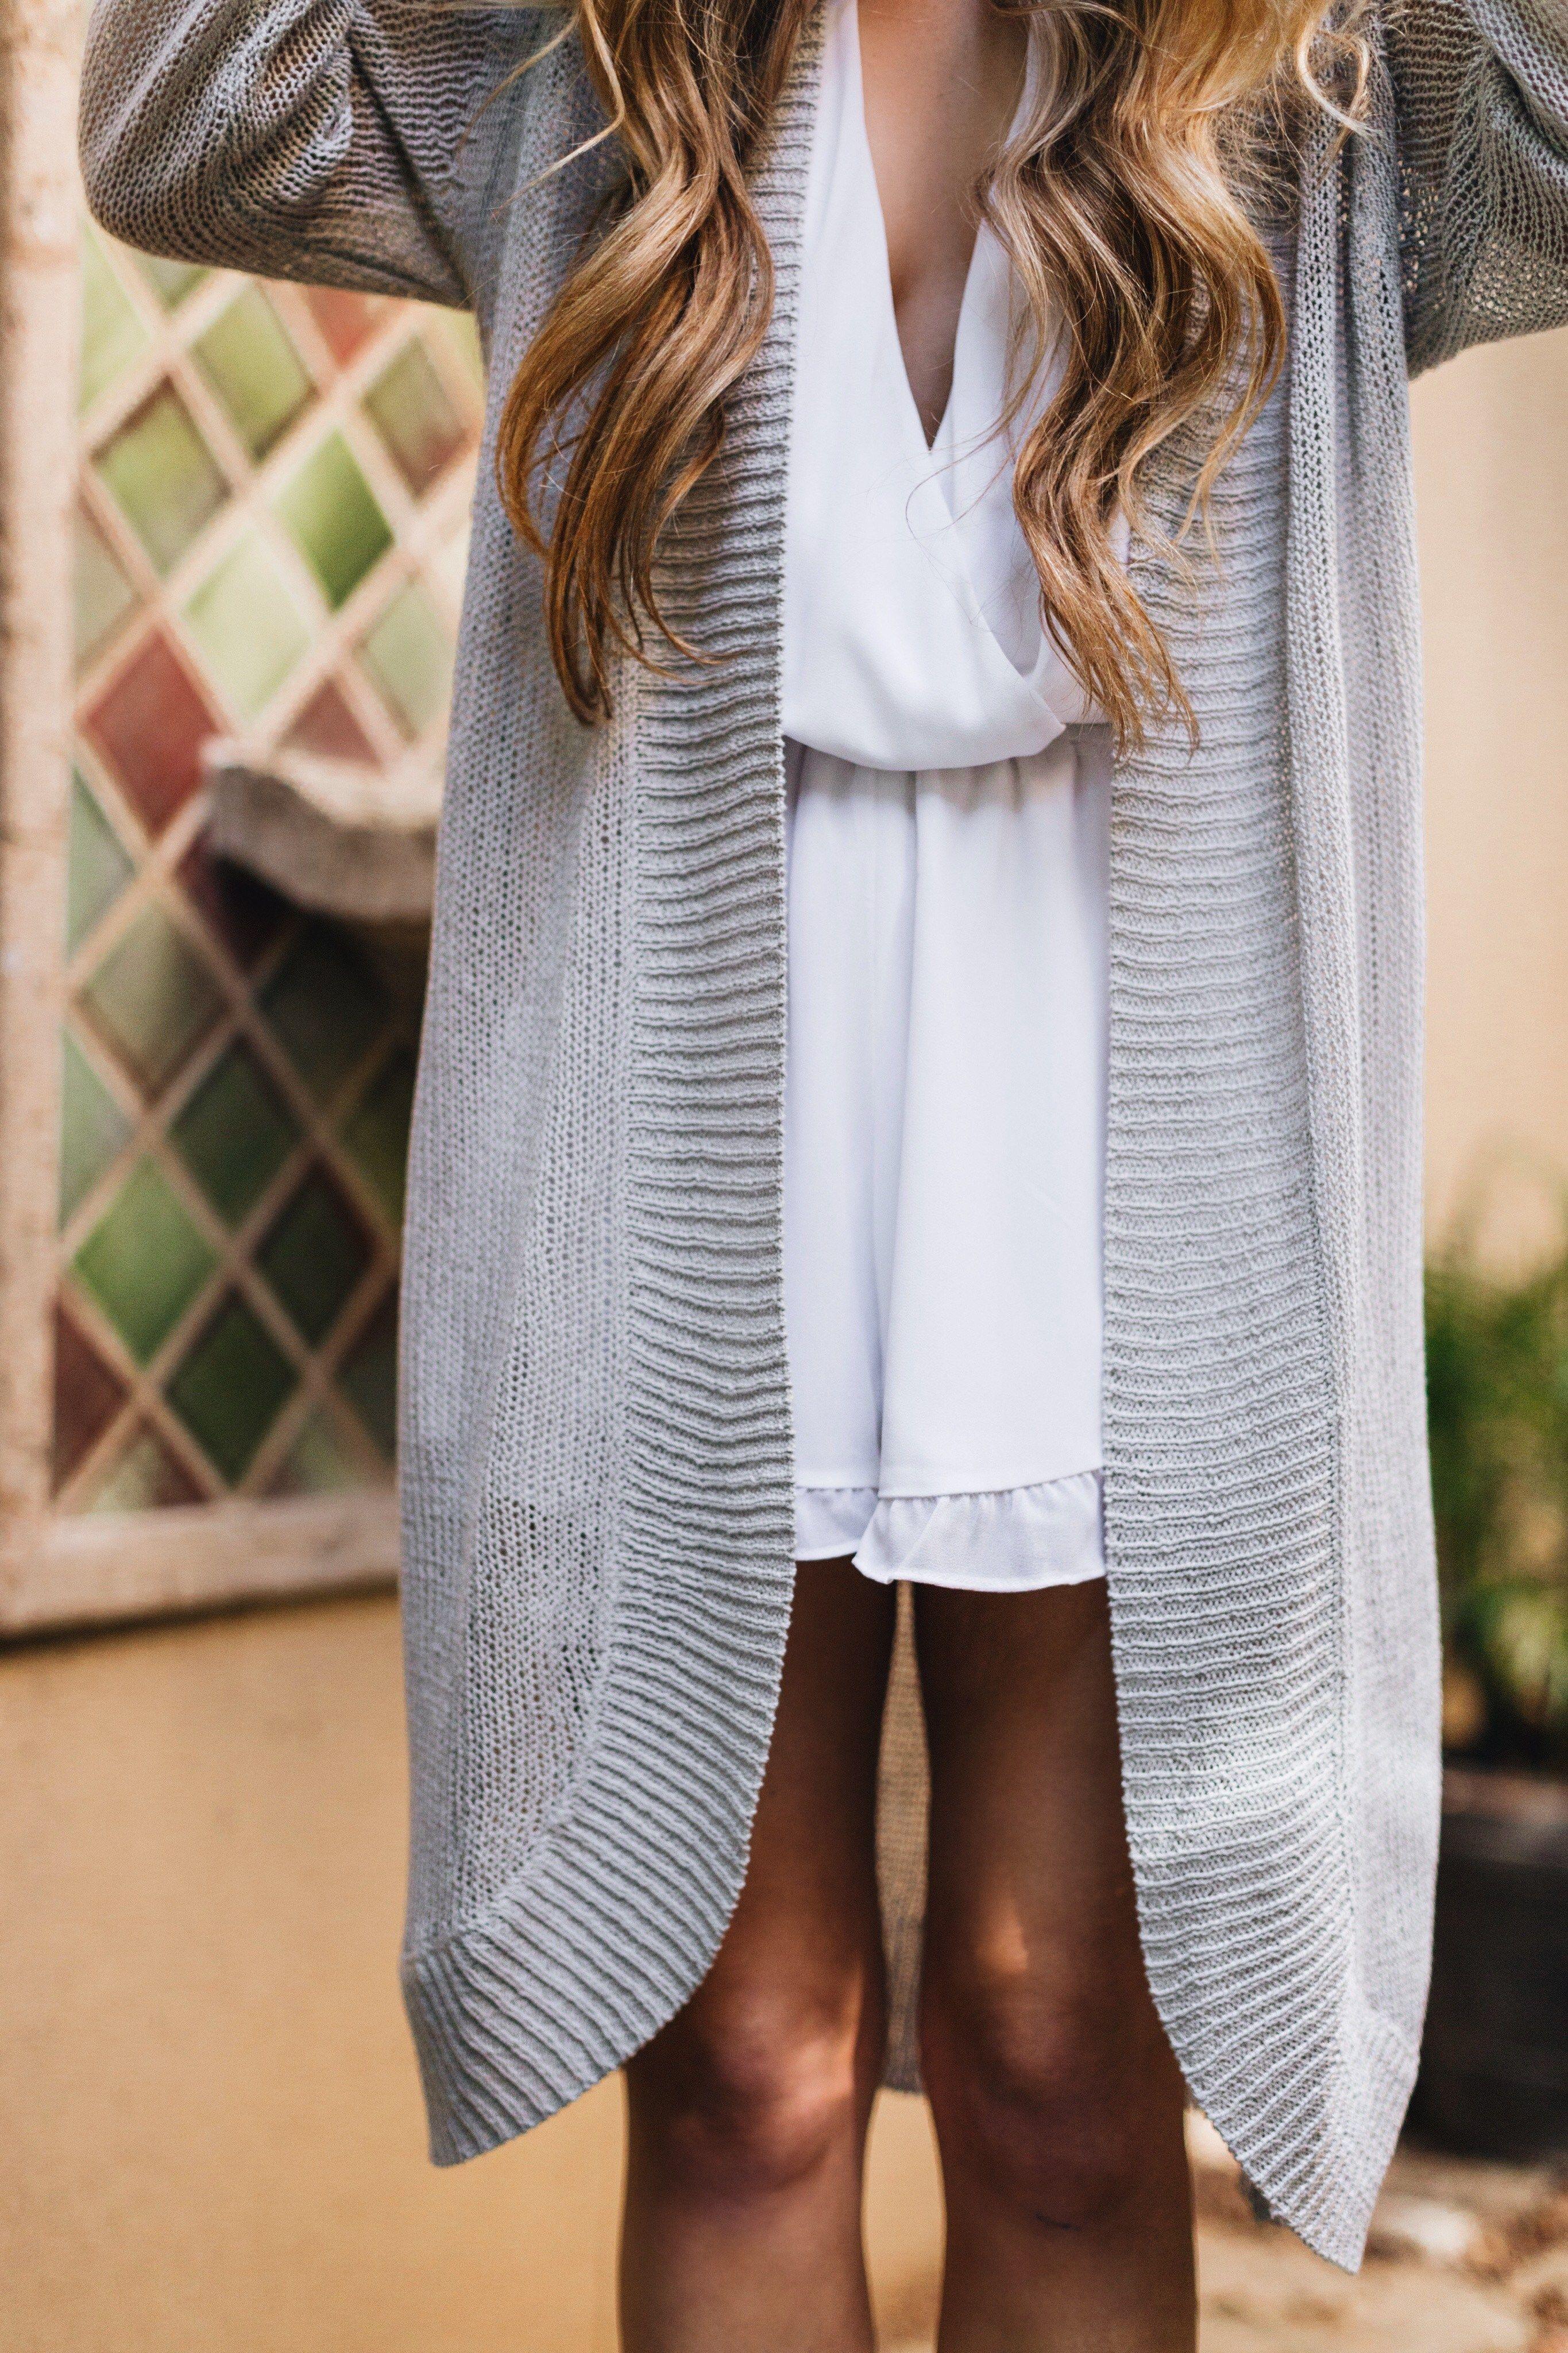 White Ruffle Romper Gray Bull Cardigan Summer Dress Inspiration Fashion Style [ 4096 x 2730 Pixel ]